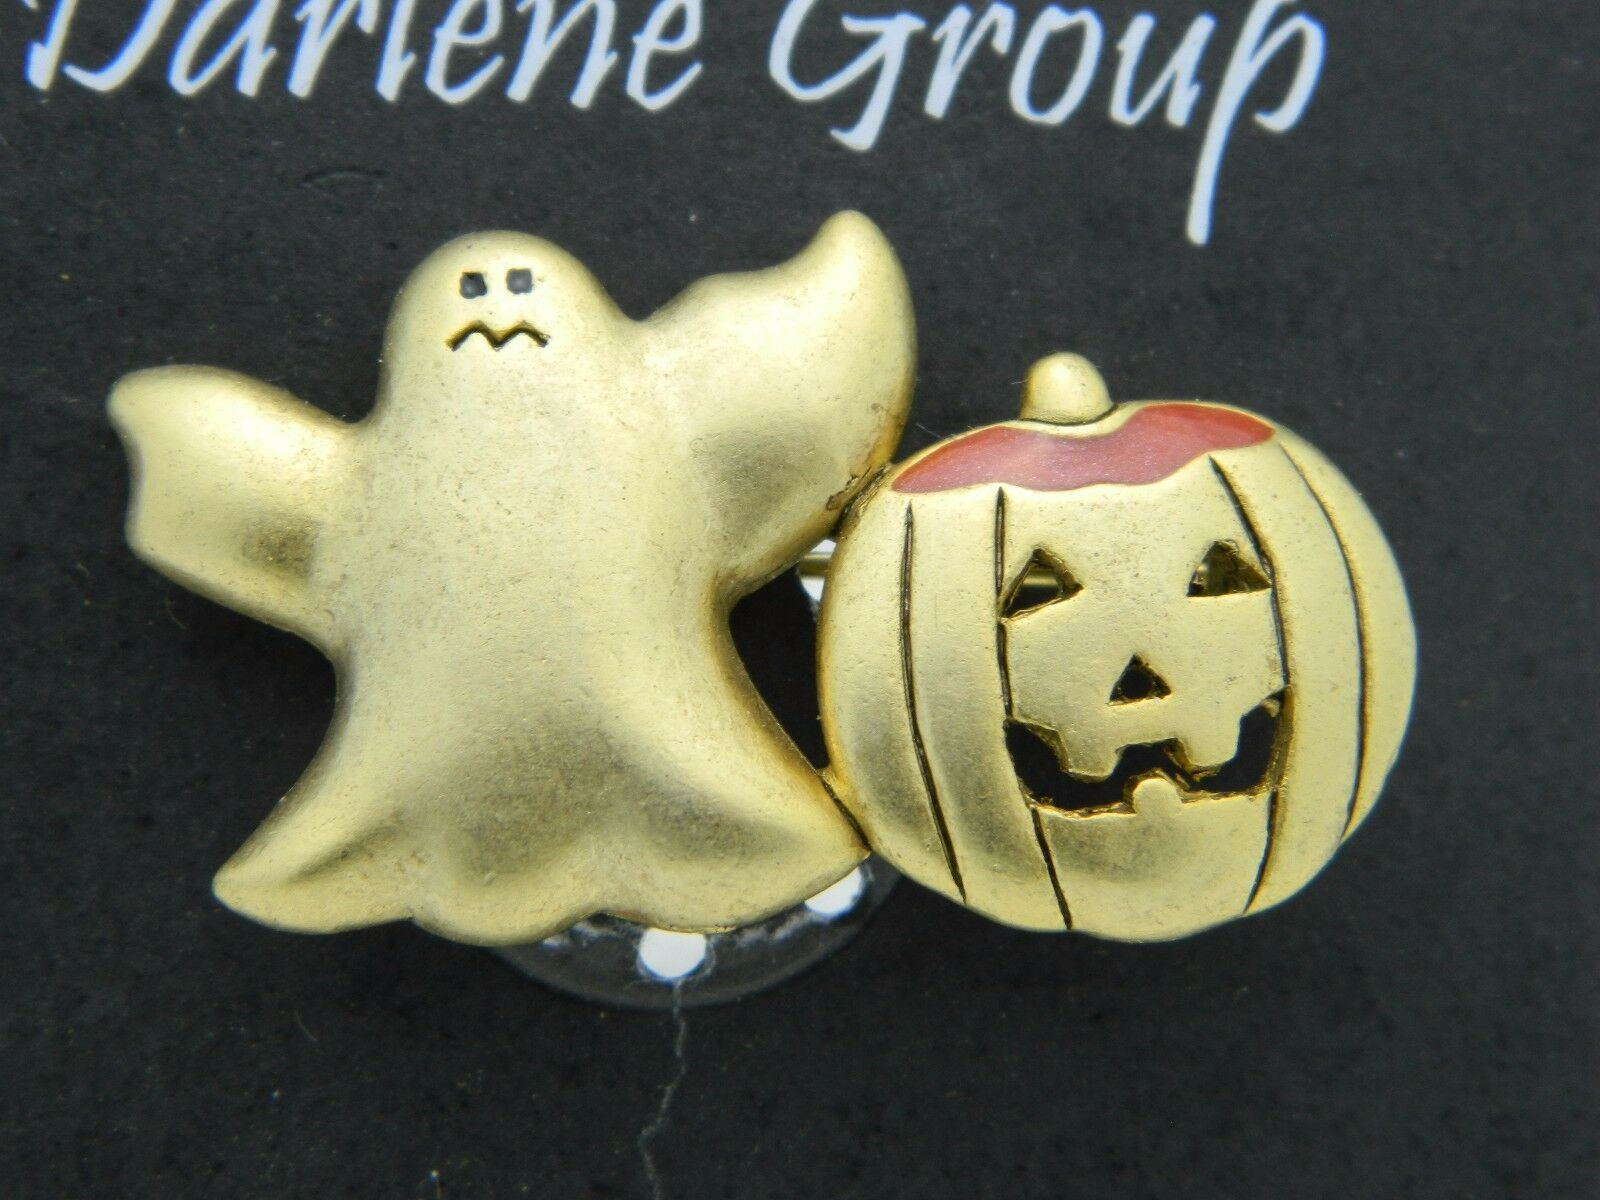 Vintage Halloween Gold Ghost Enamel Pumpkin Darlene Group Pin Brooch NOS